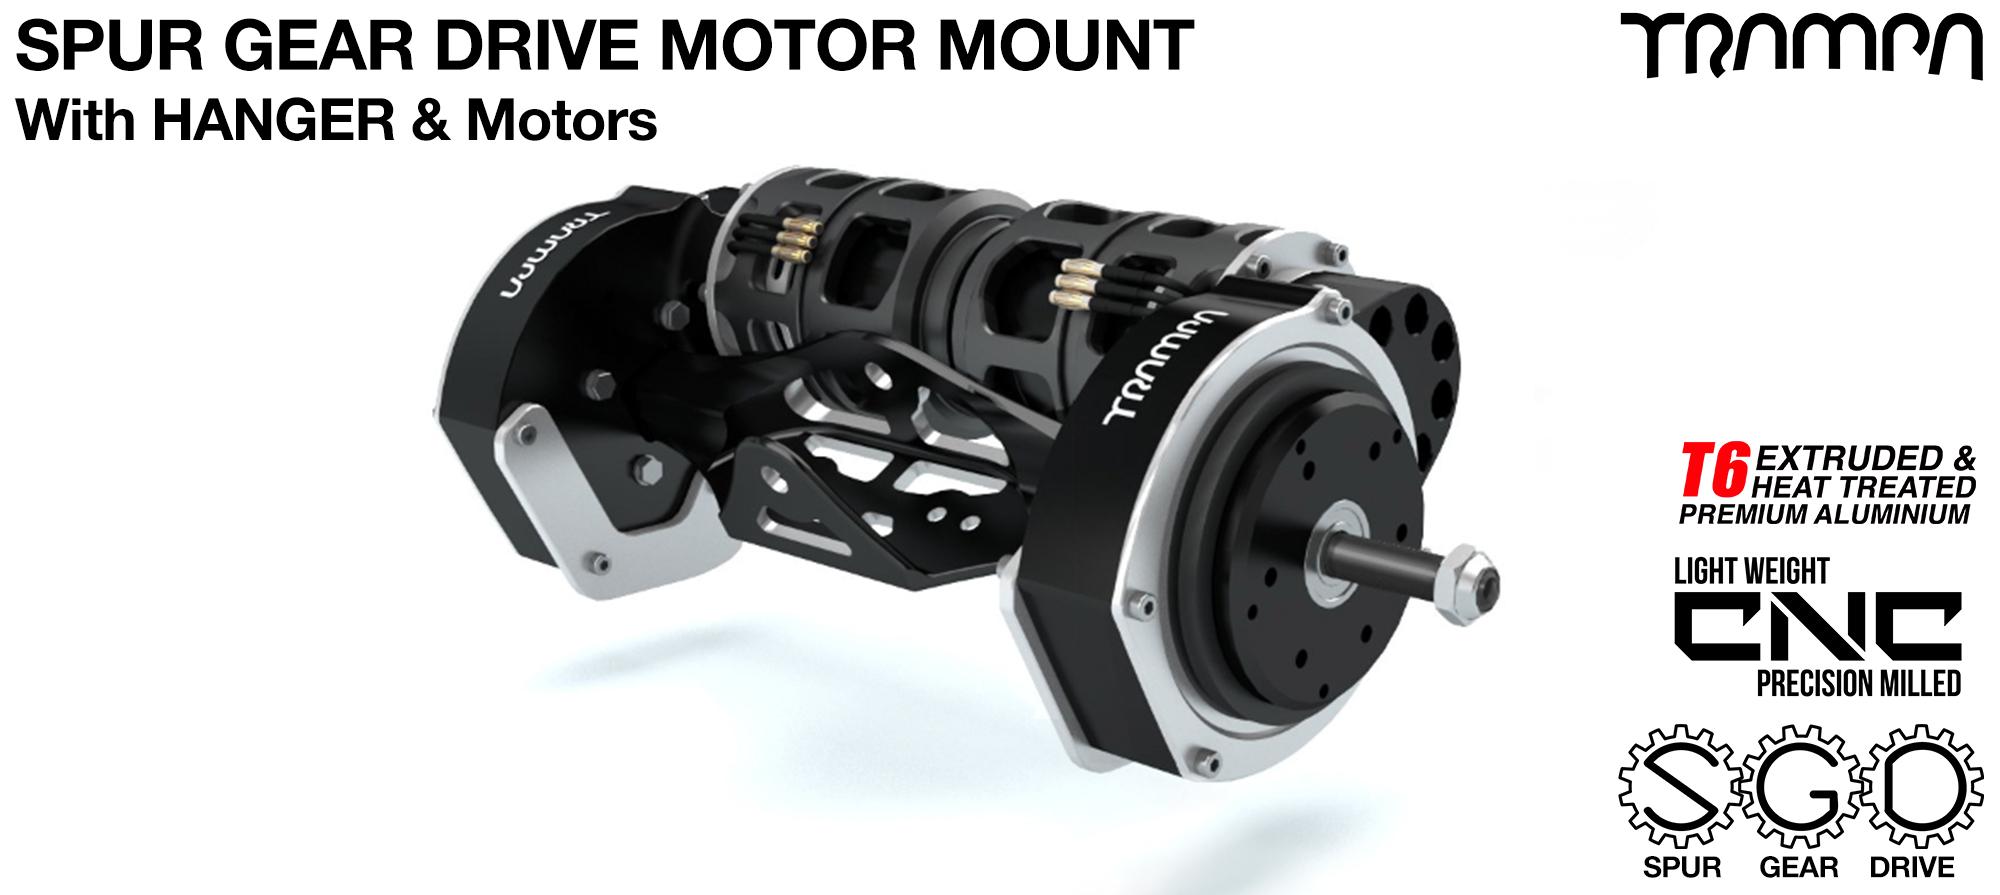 Mountainboard Spur Gear Drive TWIN Motor Mount & Hanger with Motors